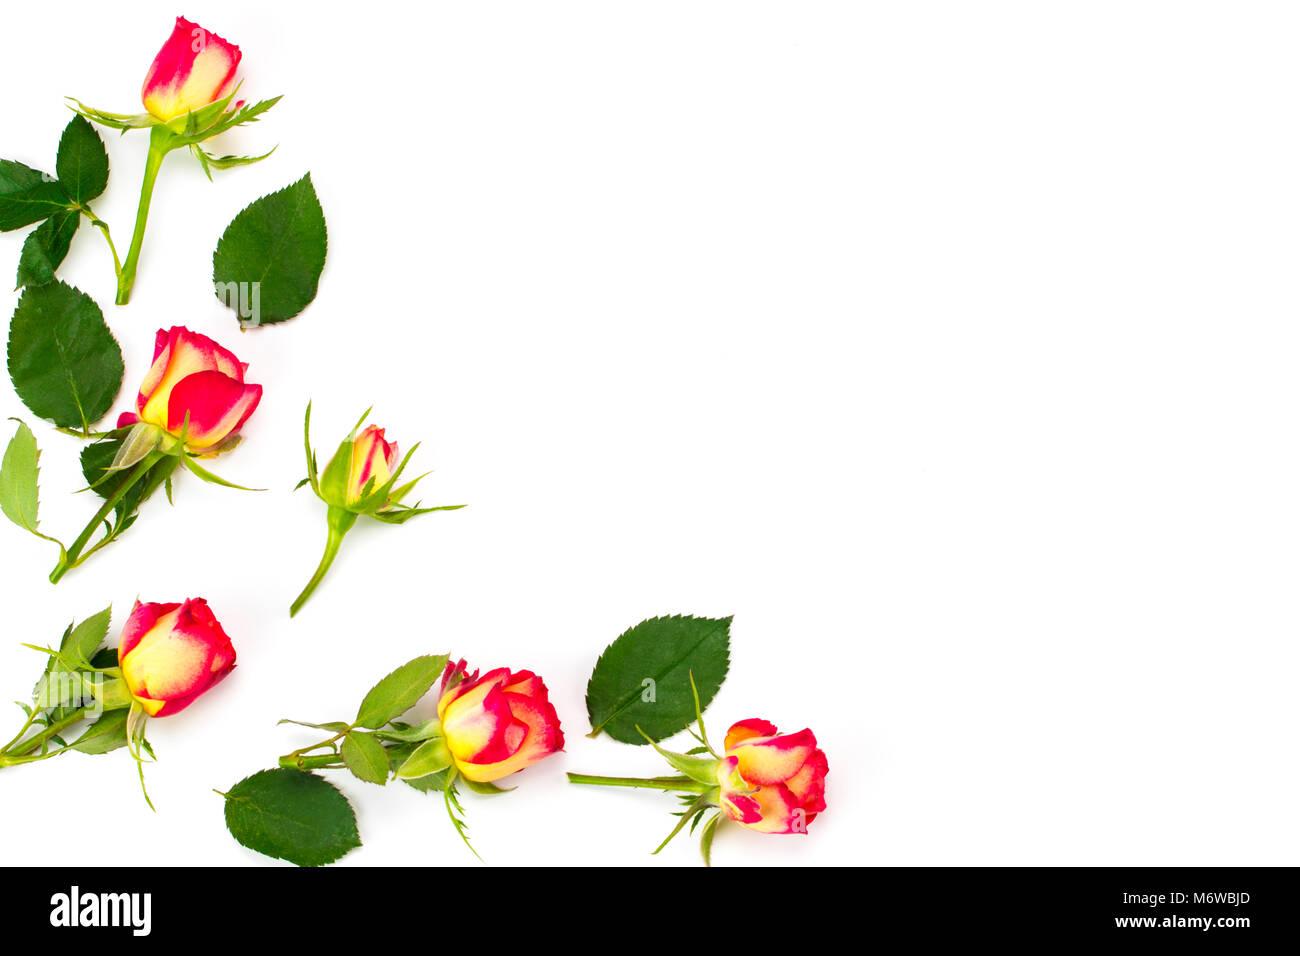 Blumen-Komposition. Gestell aus Rosenblüten. Flach legen, Top Aussicht Stockfoto